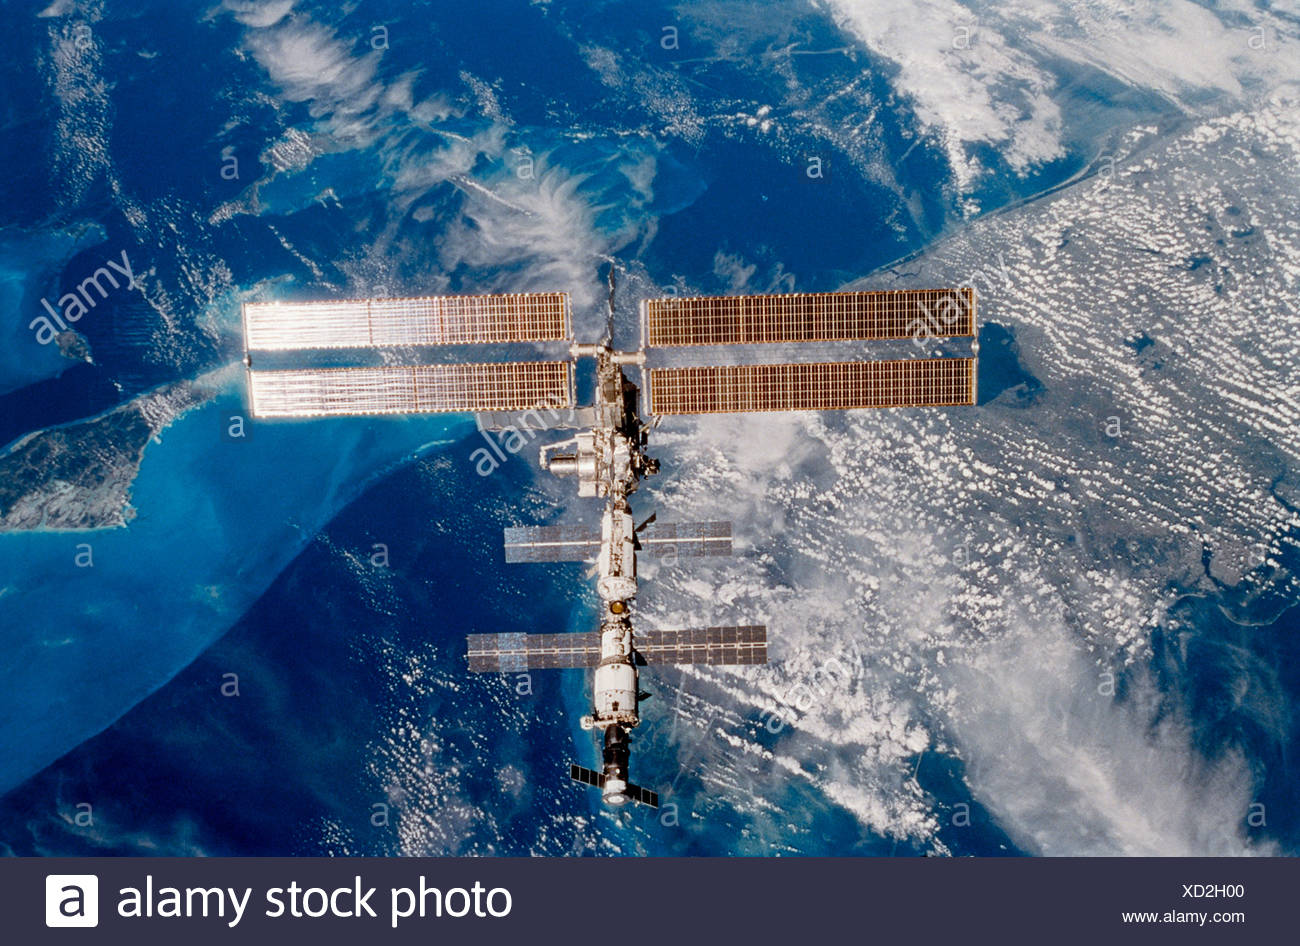 La Station spatiale internationale Photo Stock